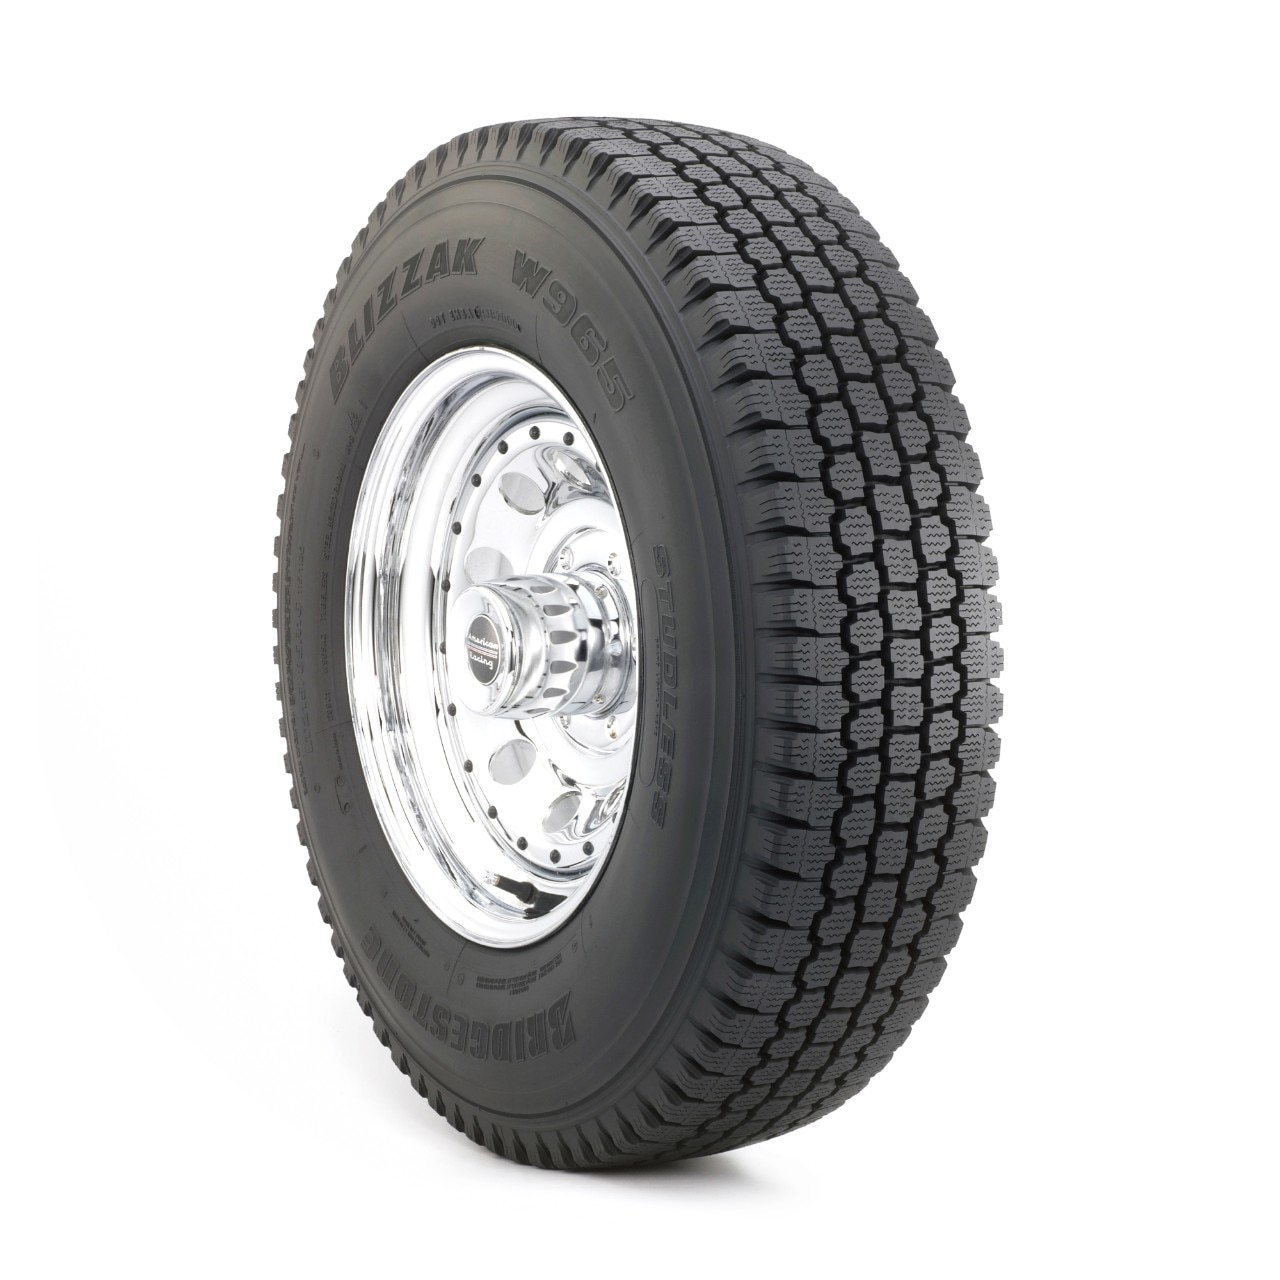 Bridgestone blizzak tire reviews - 6